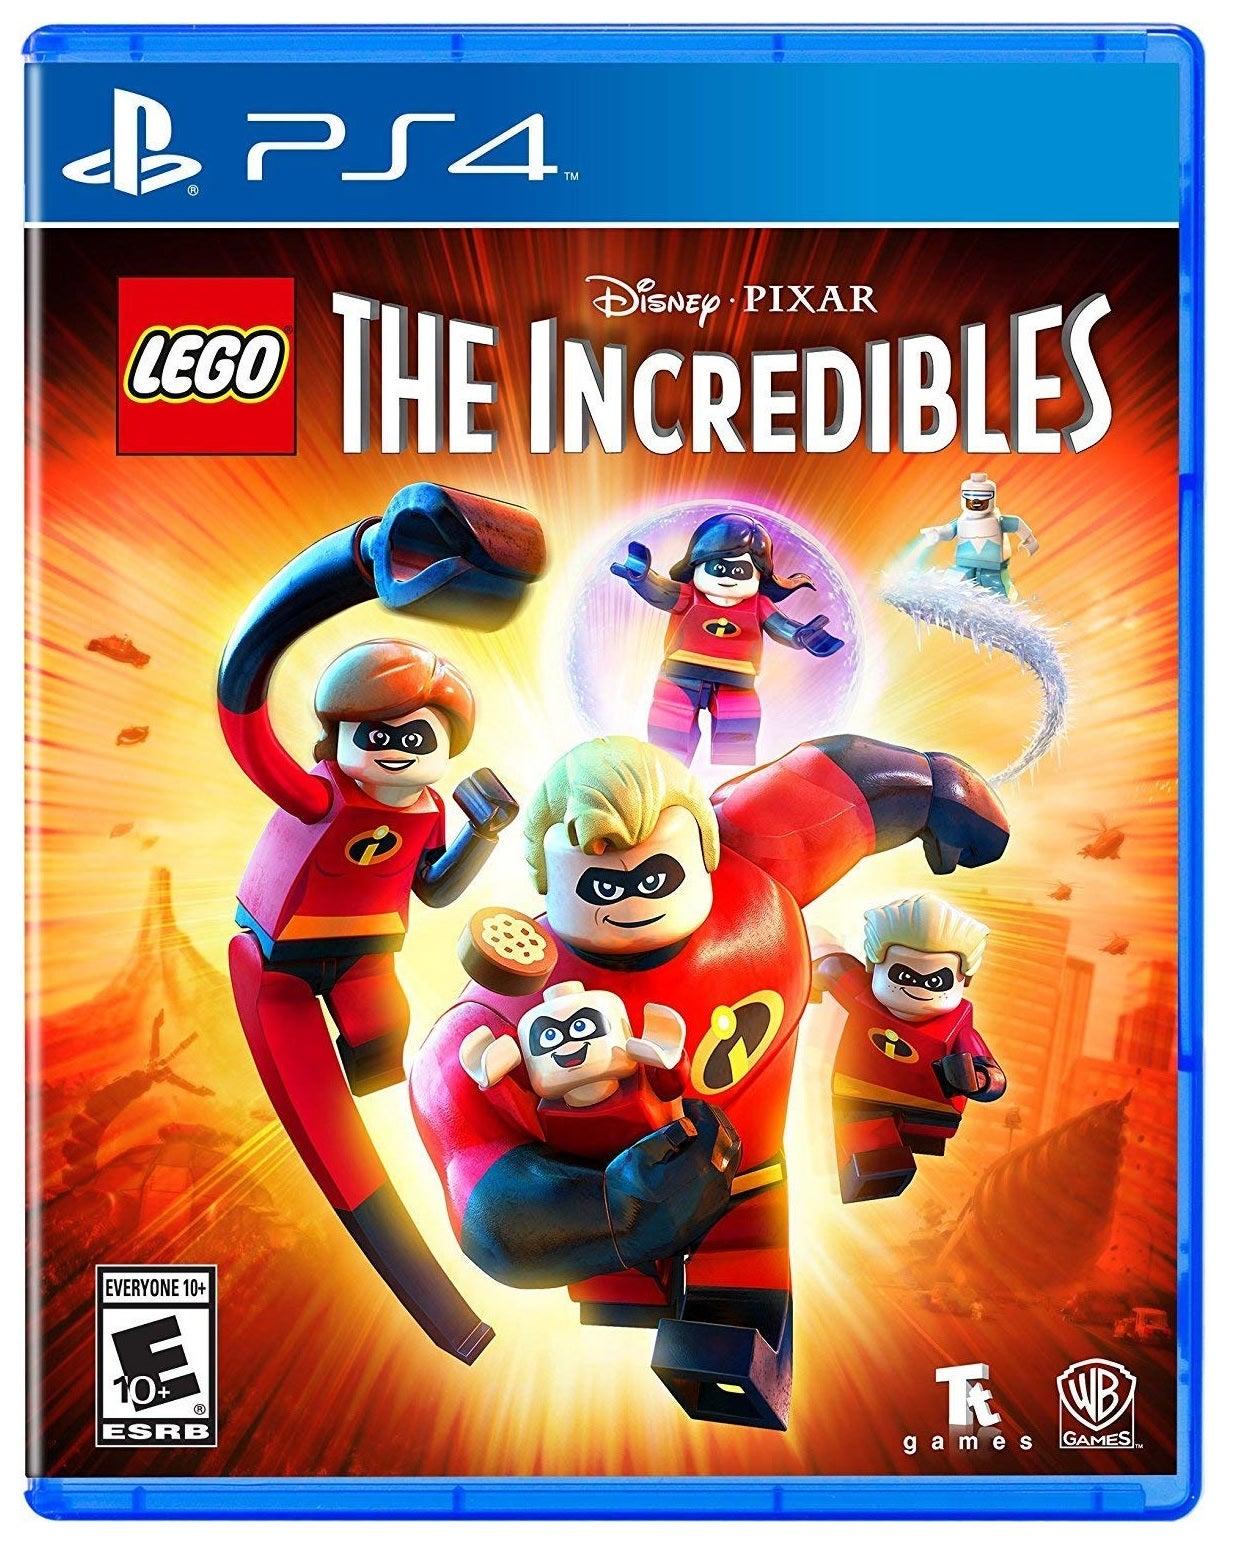 Warner Bros Lego Incredibles PS4 Playstation 4 Game